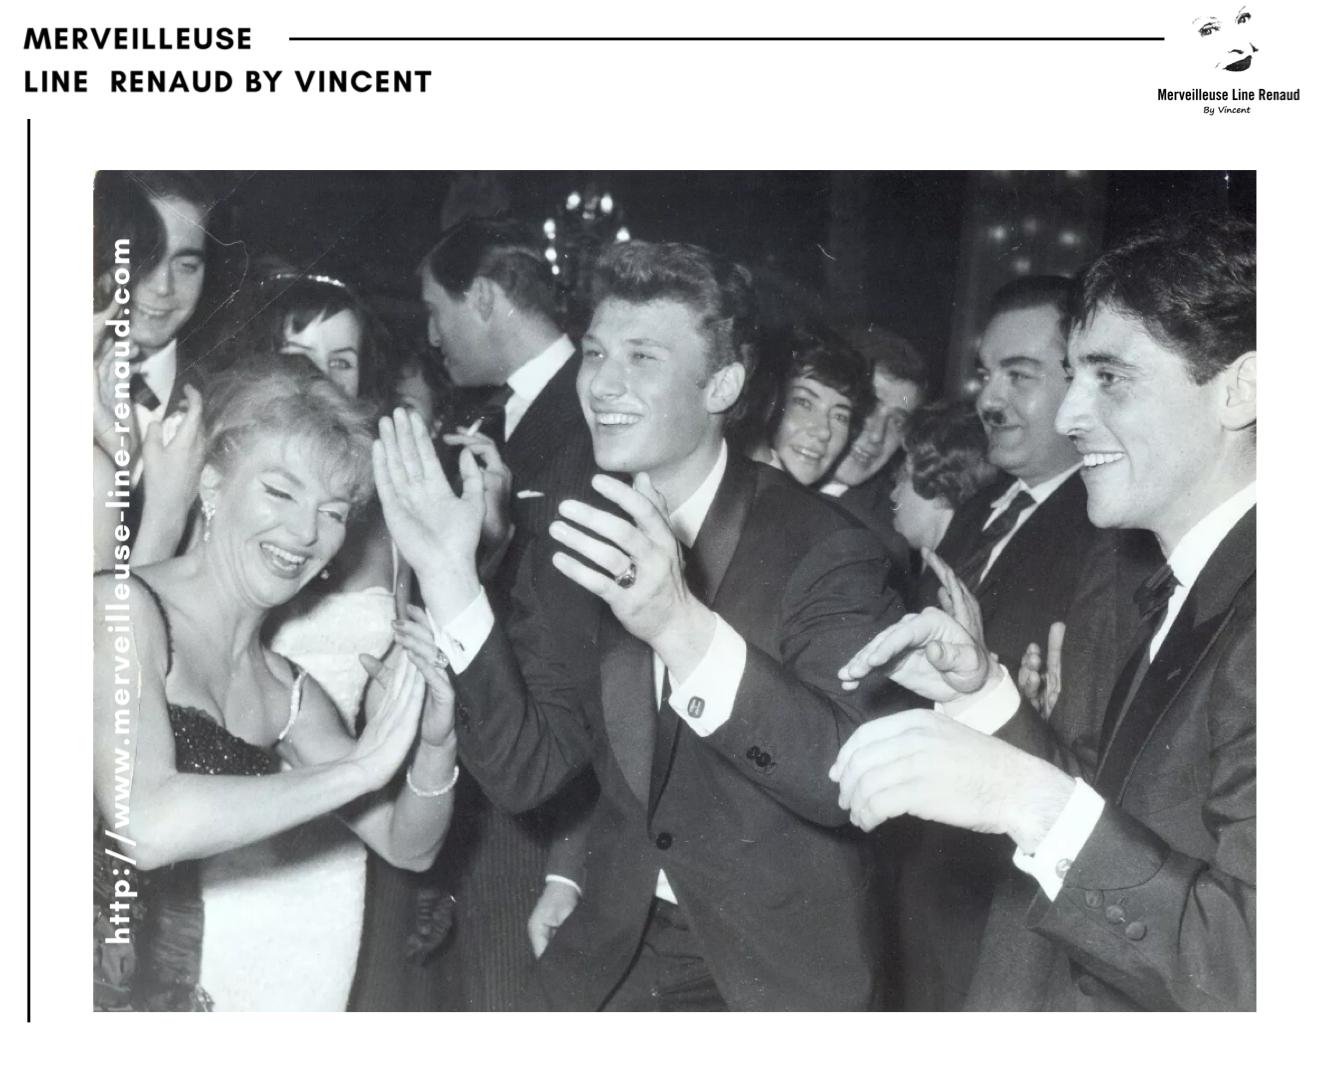 PHOTOS: Sacha Distel, Johnny Hallyday et Line Renaud (2 Photos)